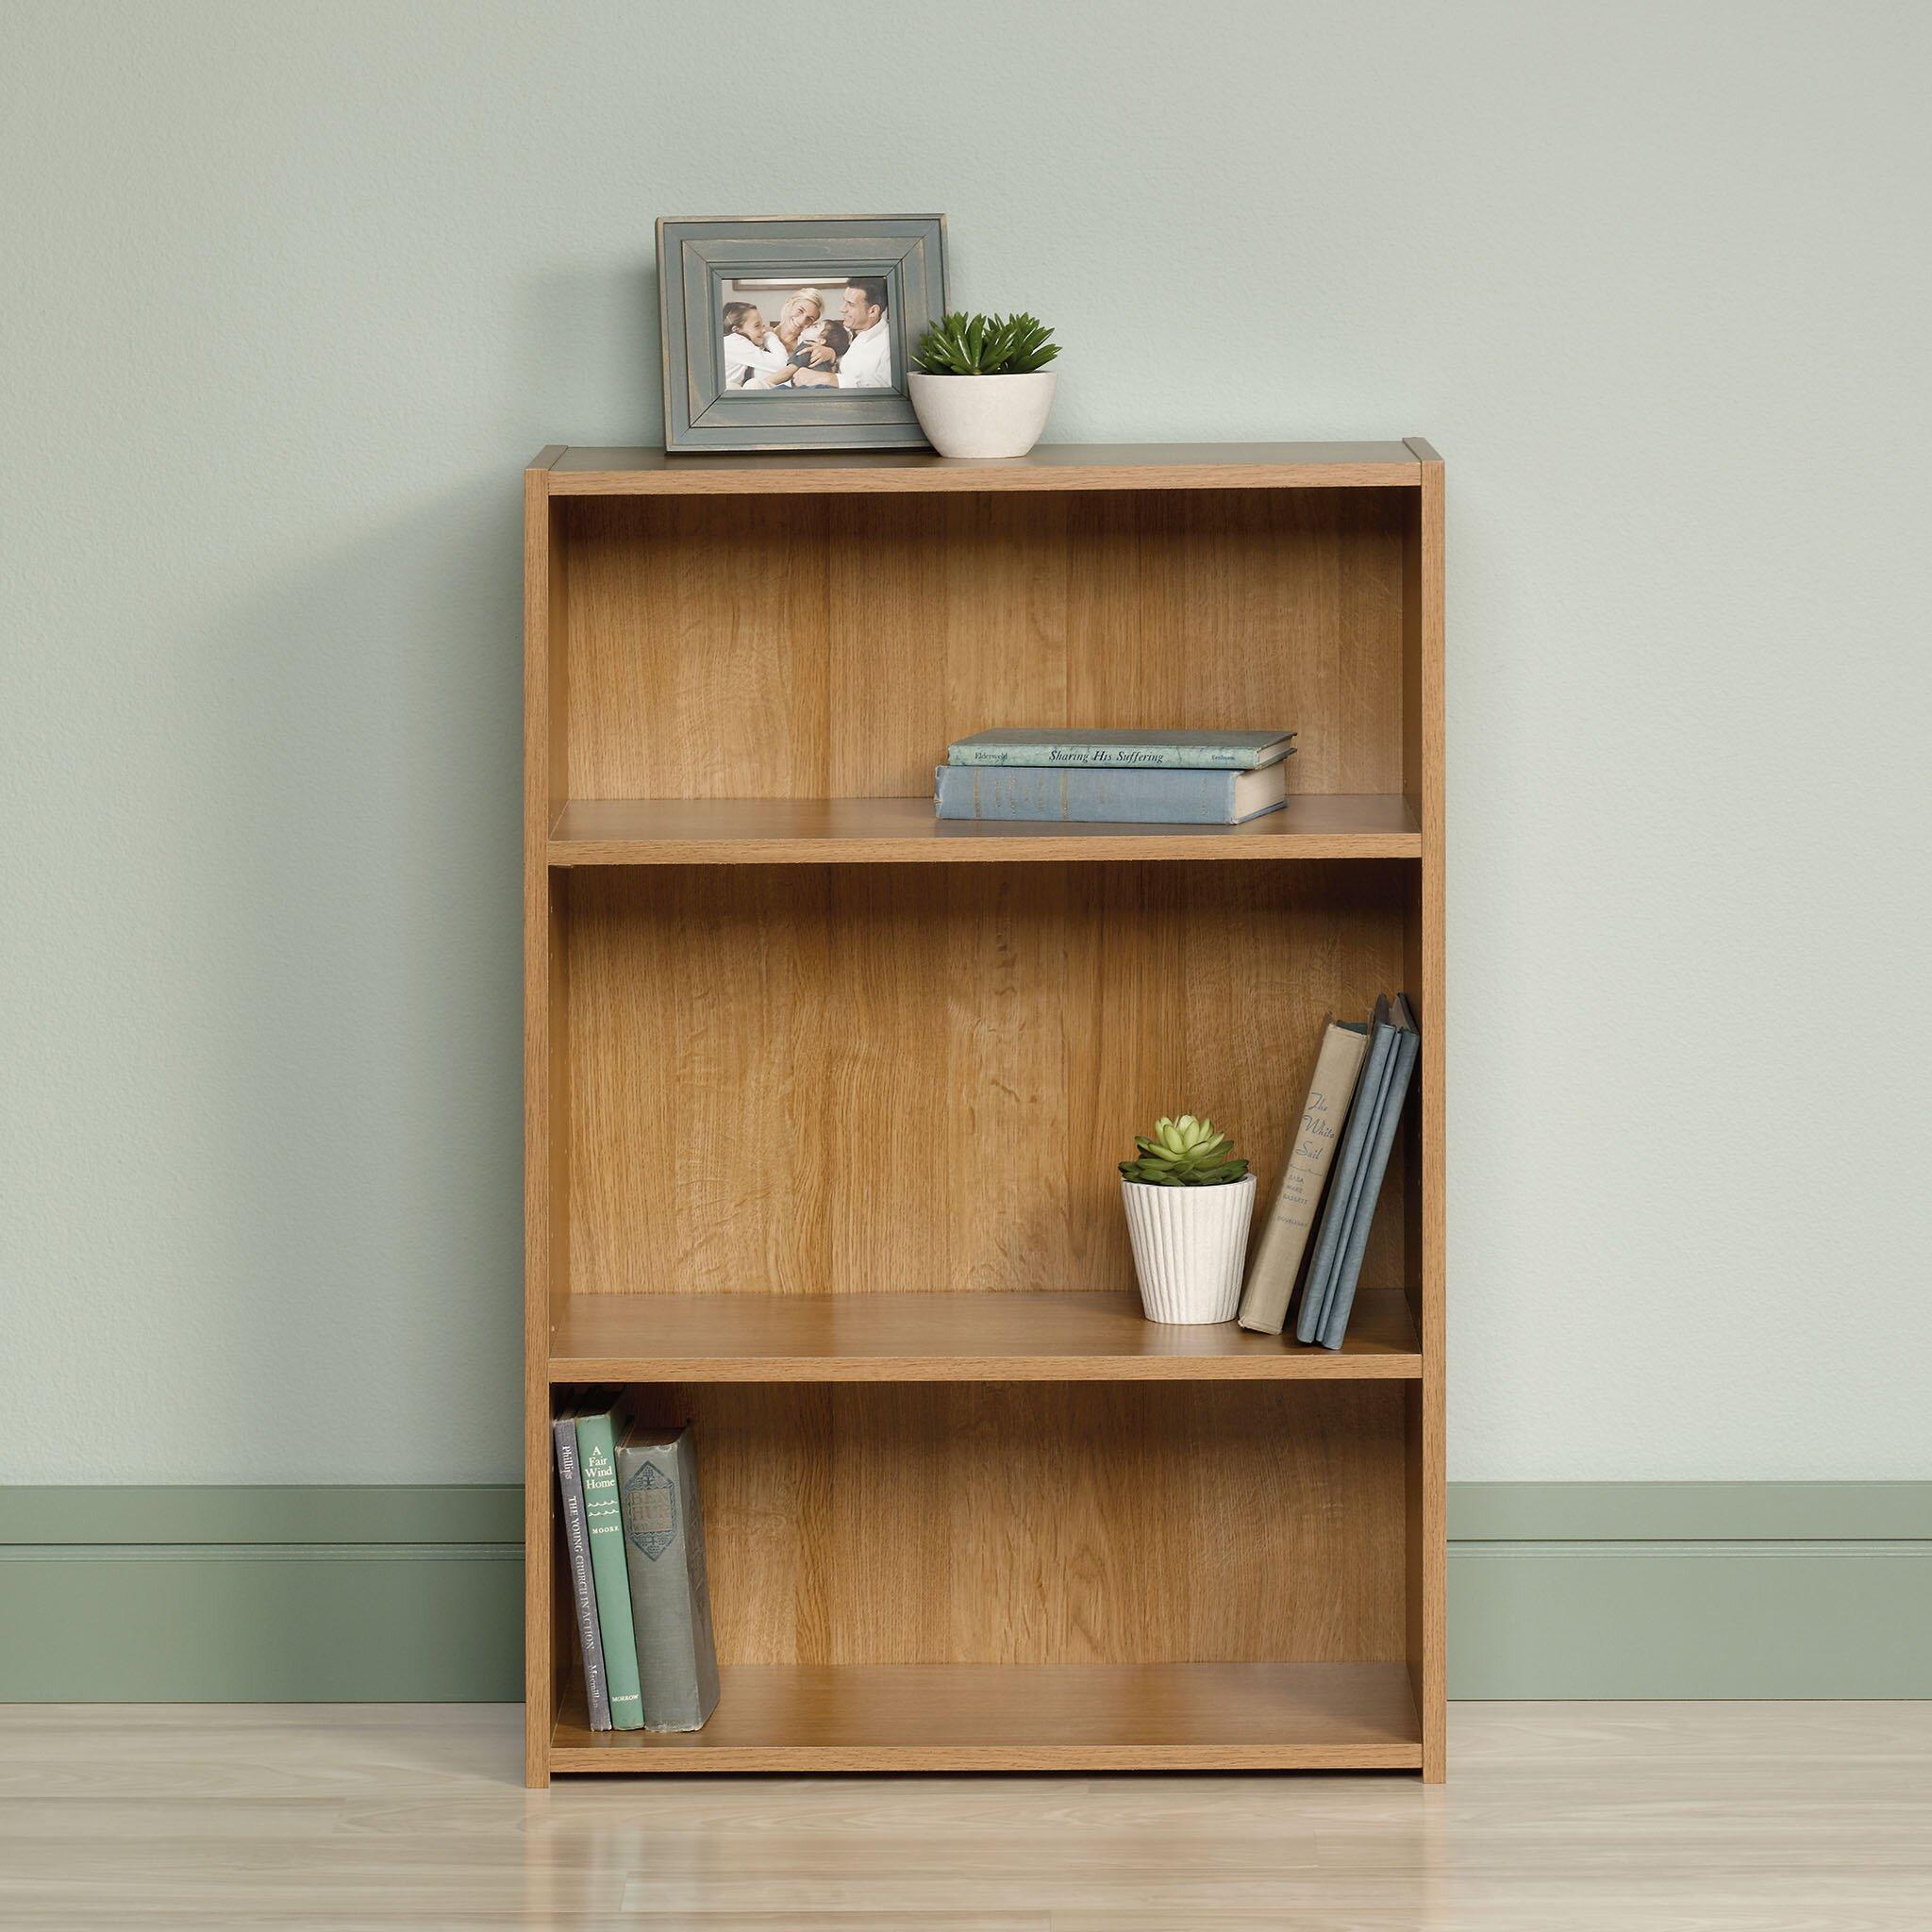 sauder beginnings standard bookcase reviews wayfair. Black Bedroom Furniture Sets. Home Design Ideas